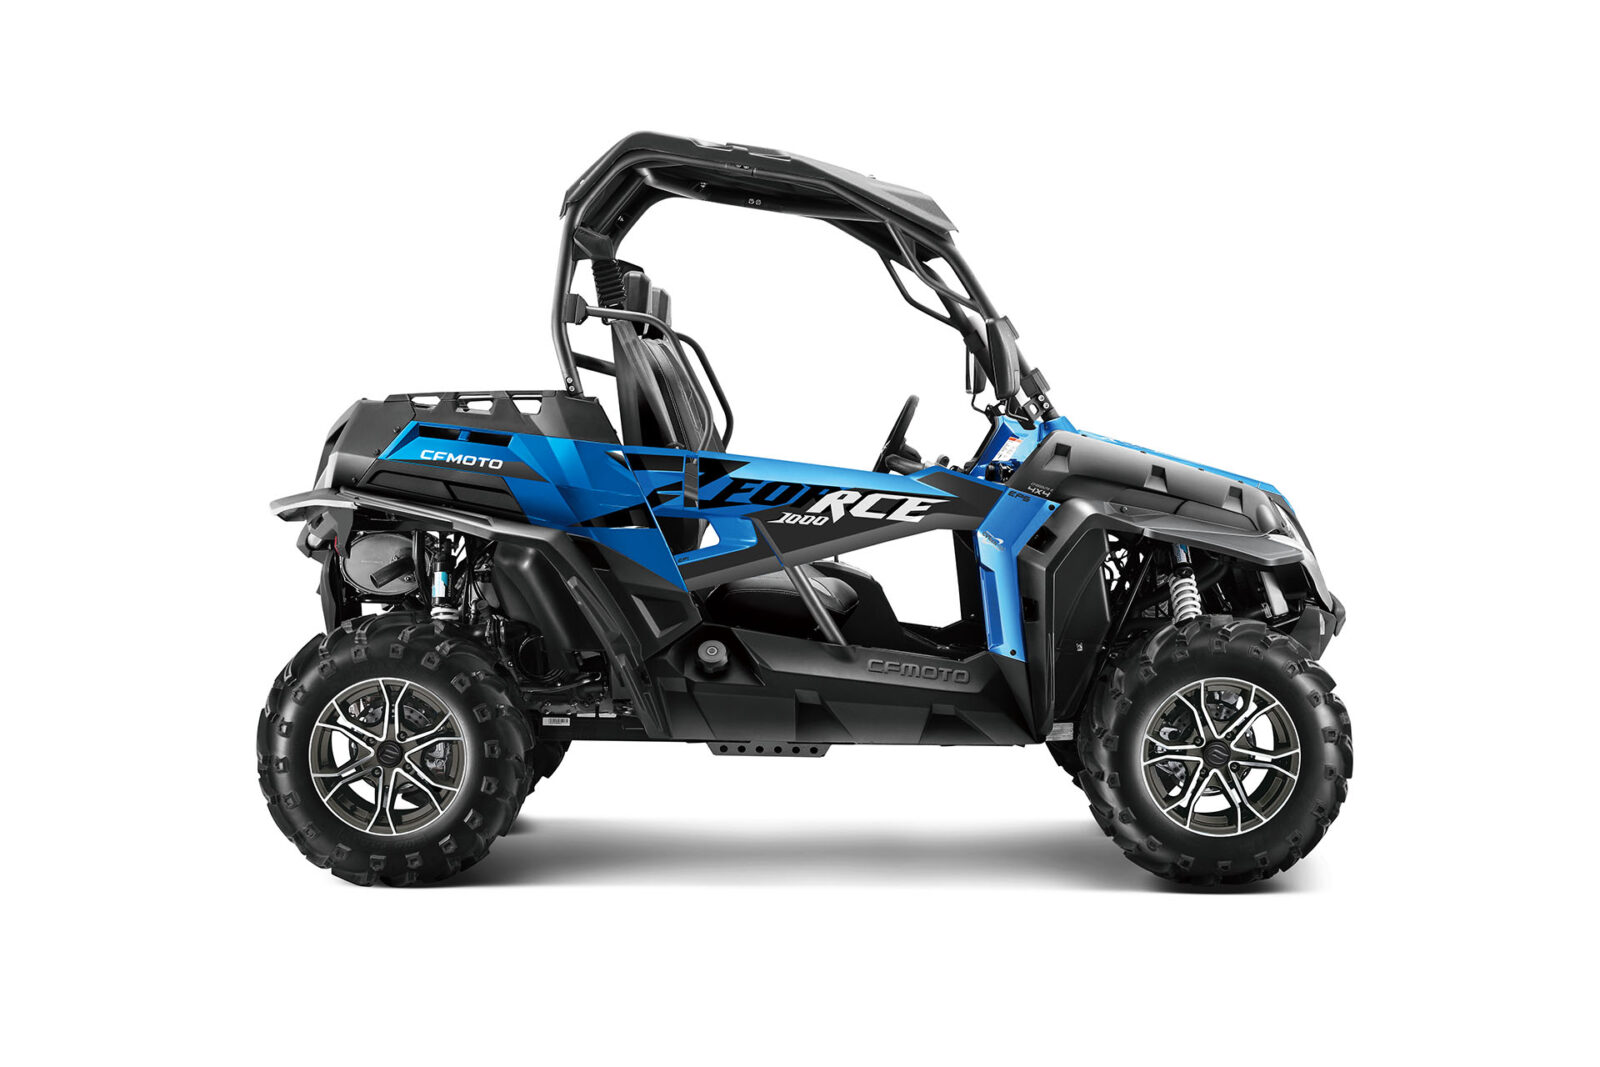 2021 ZFORCE1000 90 BLUE 10464974